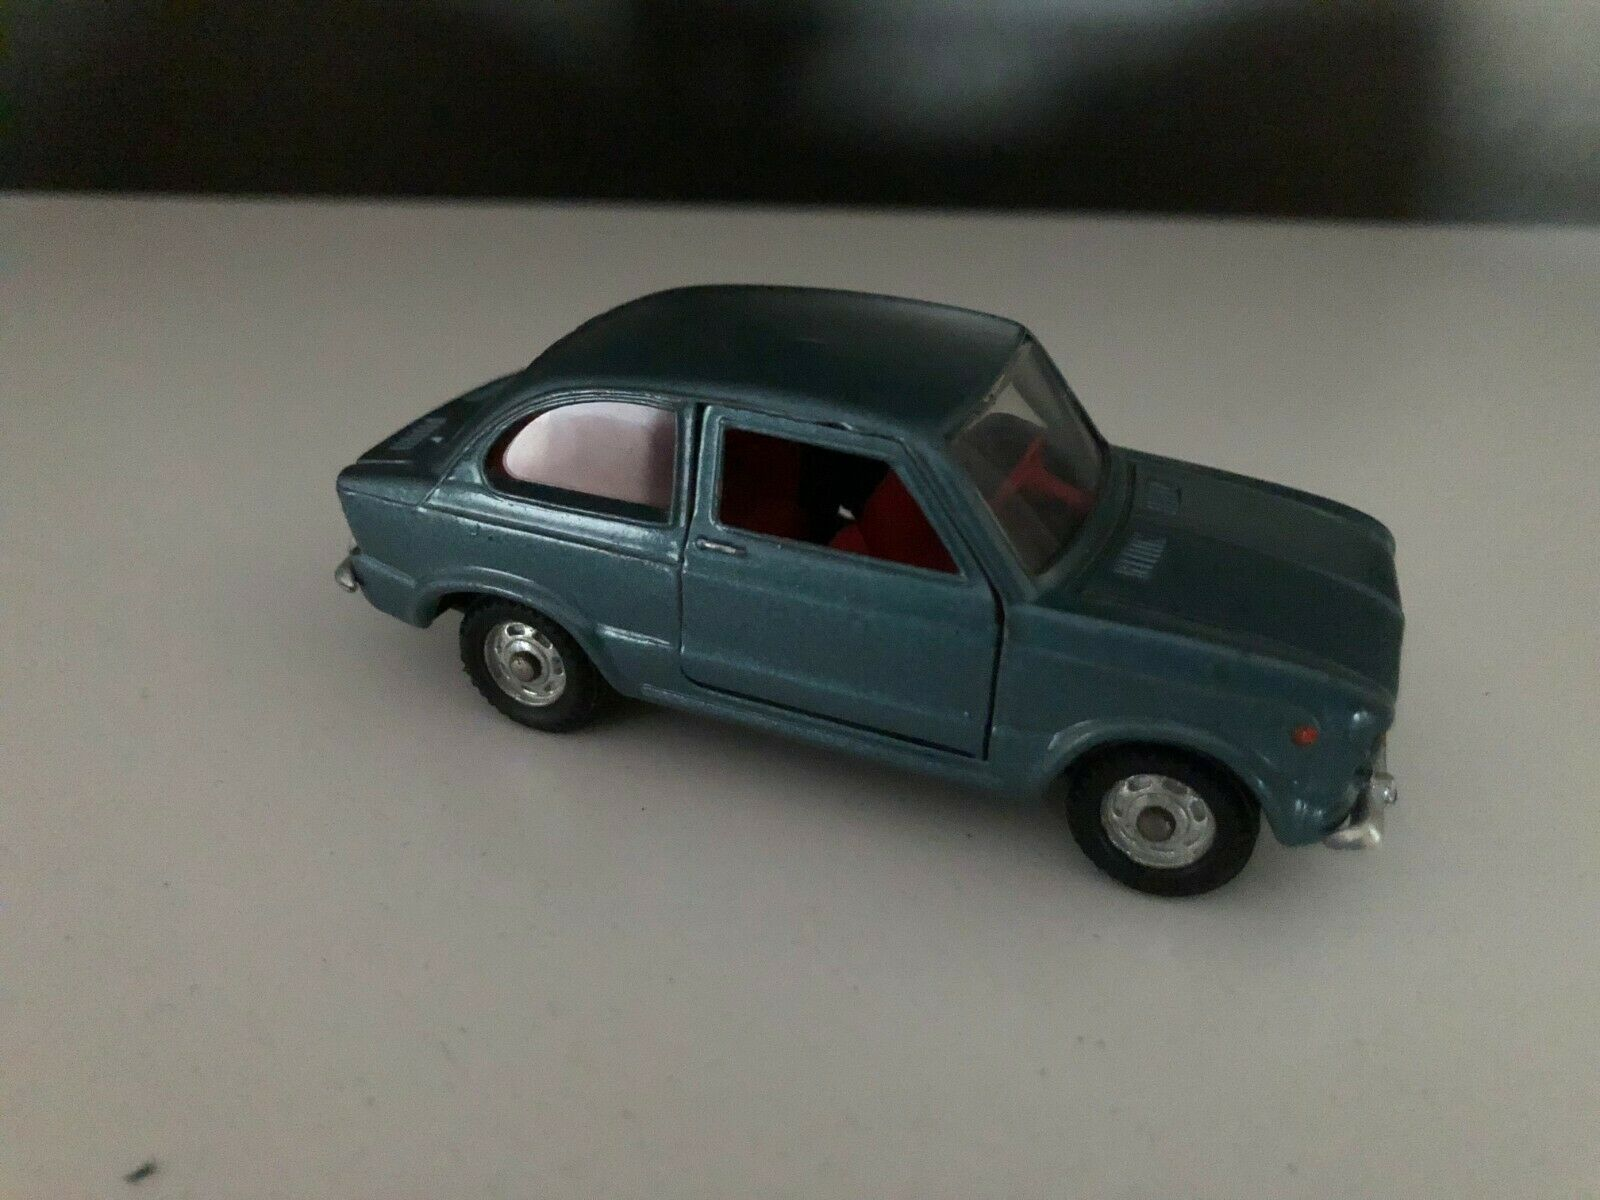 MEBEgiocattoli - - - FIAT 850 BERLINA 1^SERIE - SCALA 1 43 a77a00